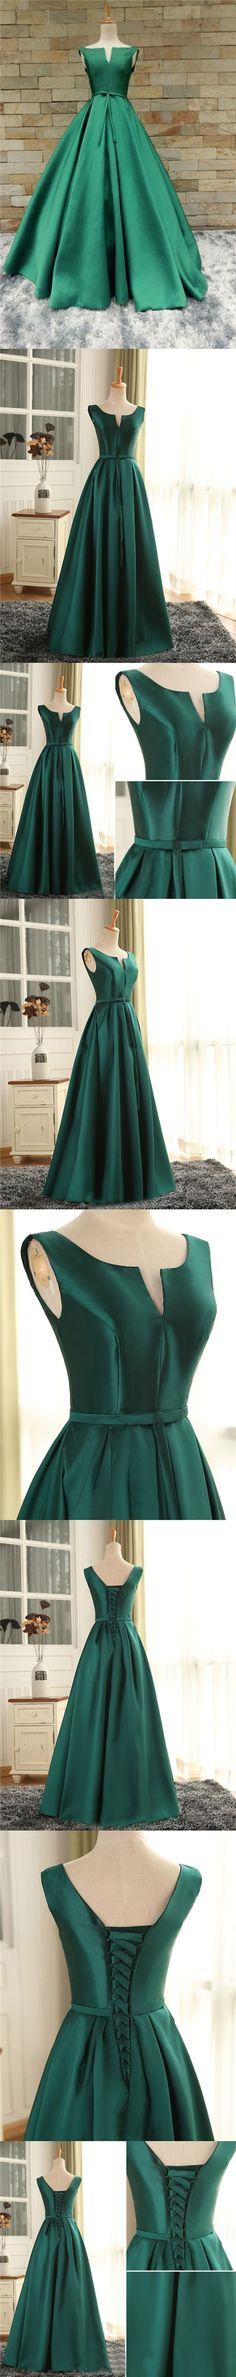 Cheap Prom Dresses Sexy Scoop Dark Green Satin Long Prom Dress/Evening Dress JKL259#hunter #Huntergreen #longdress #longpromdresses #longpromdress #promdress #promdresses #Off-the-shoulder #off the shoulder dress  #bowknot